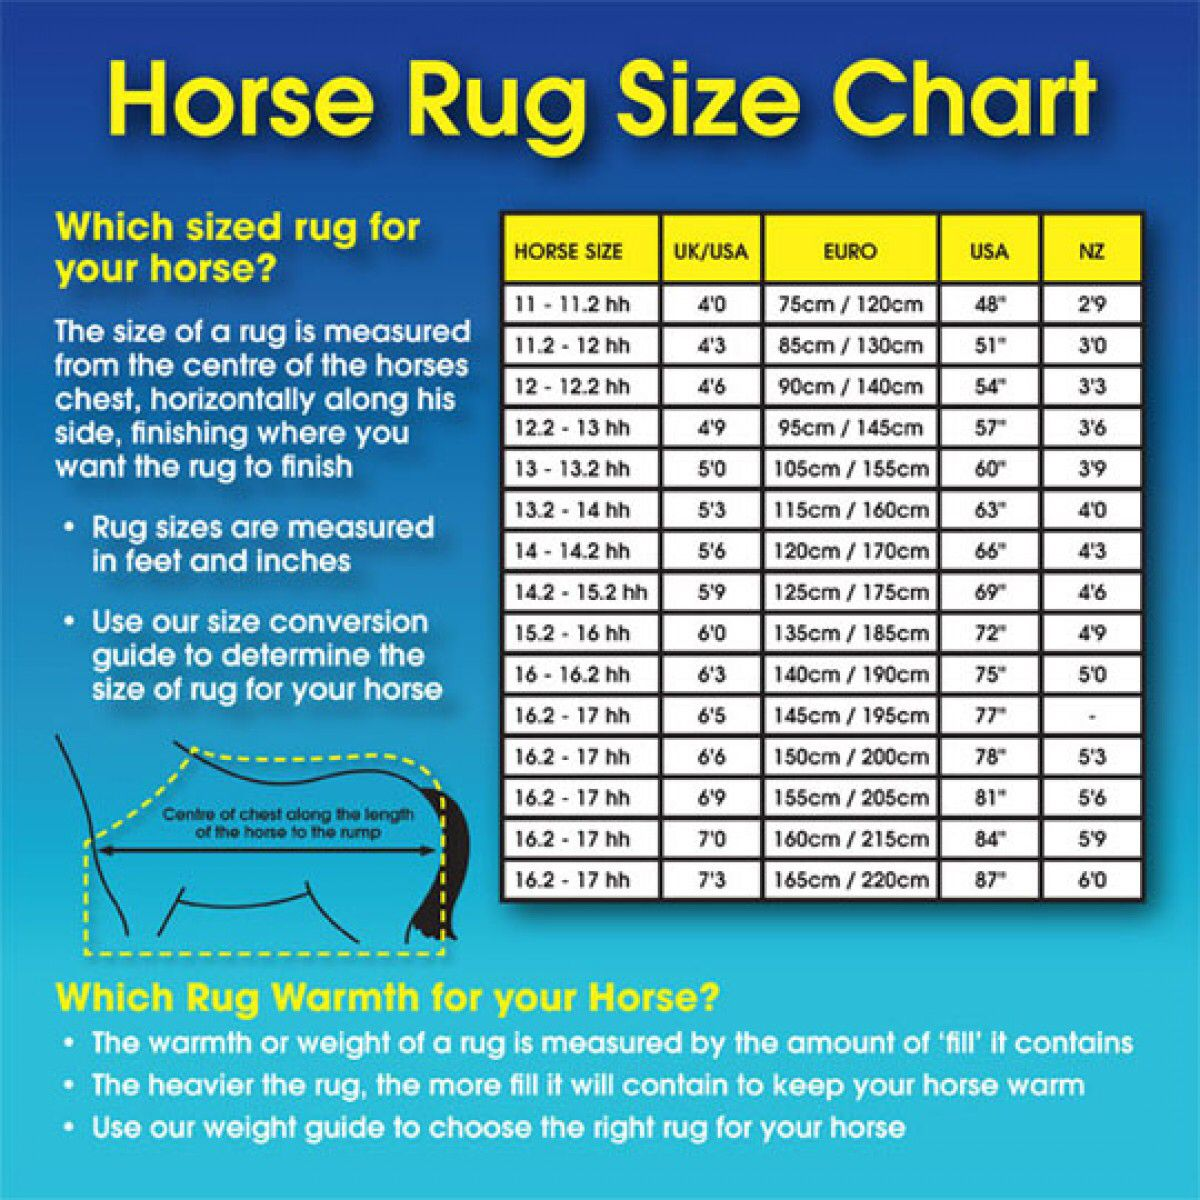 Horse rug size chart horse rugs rug size horse sheet